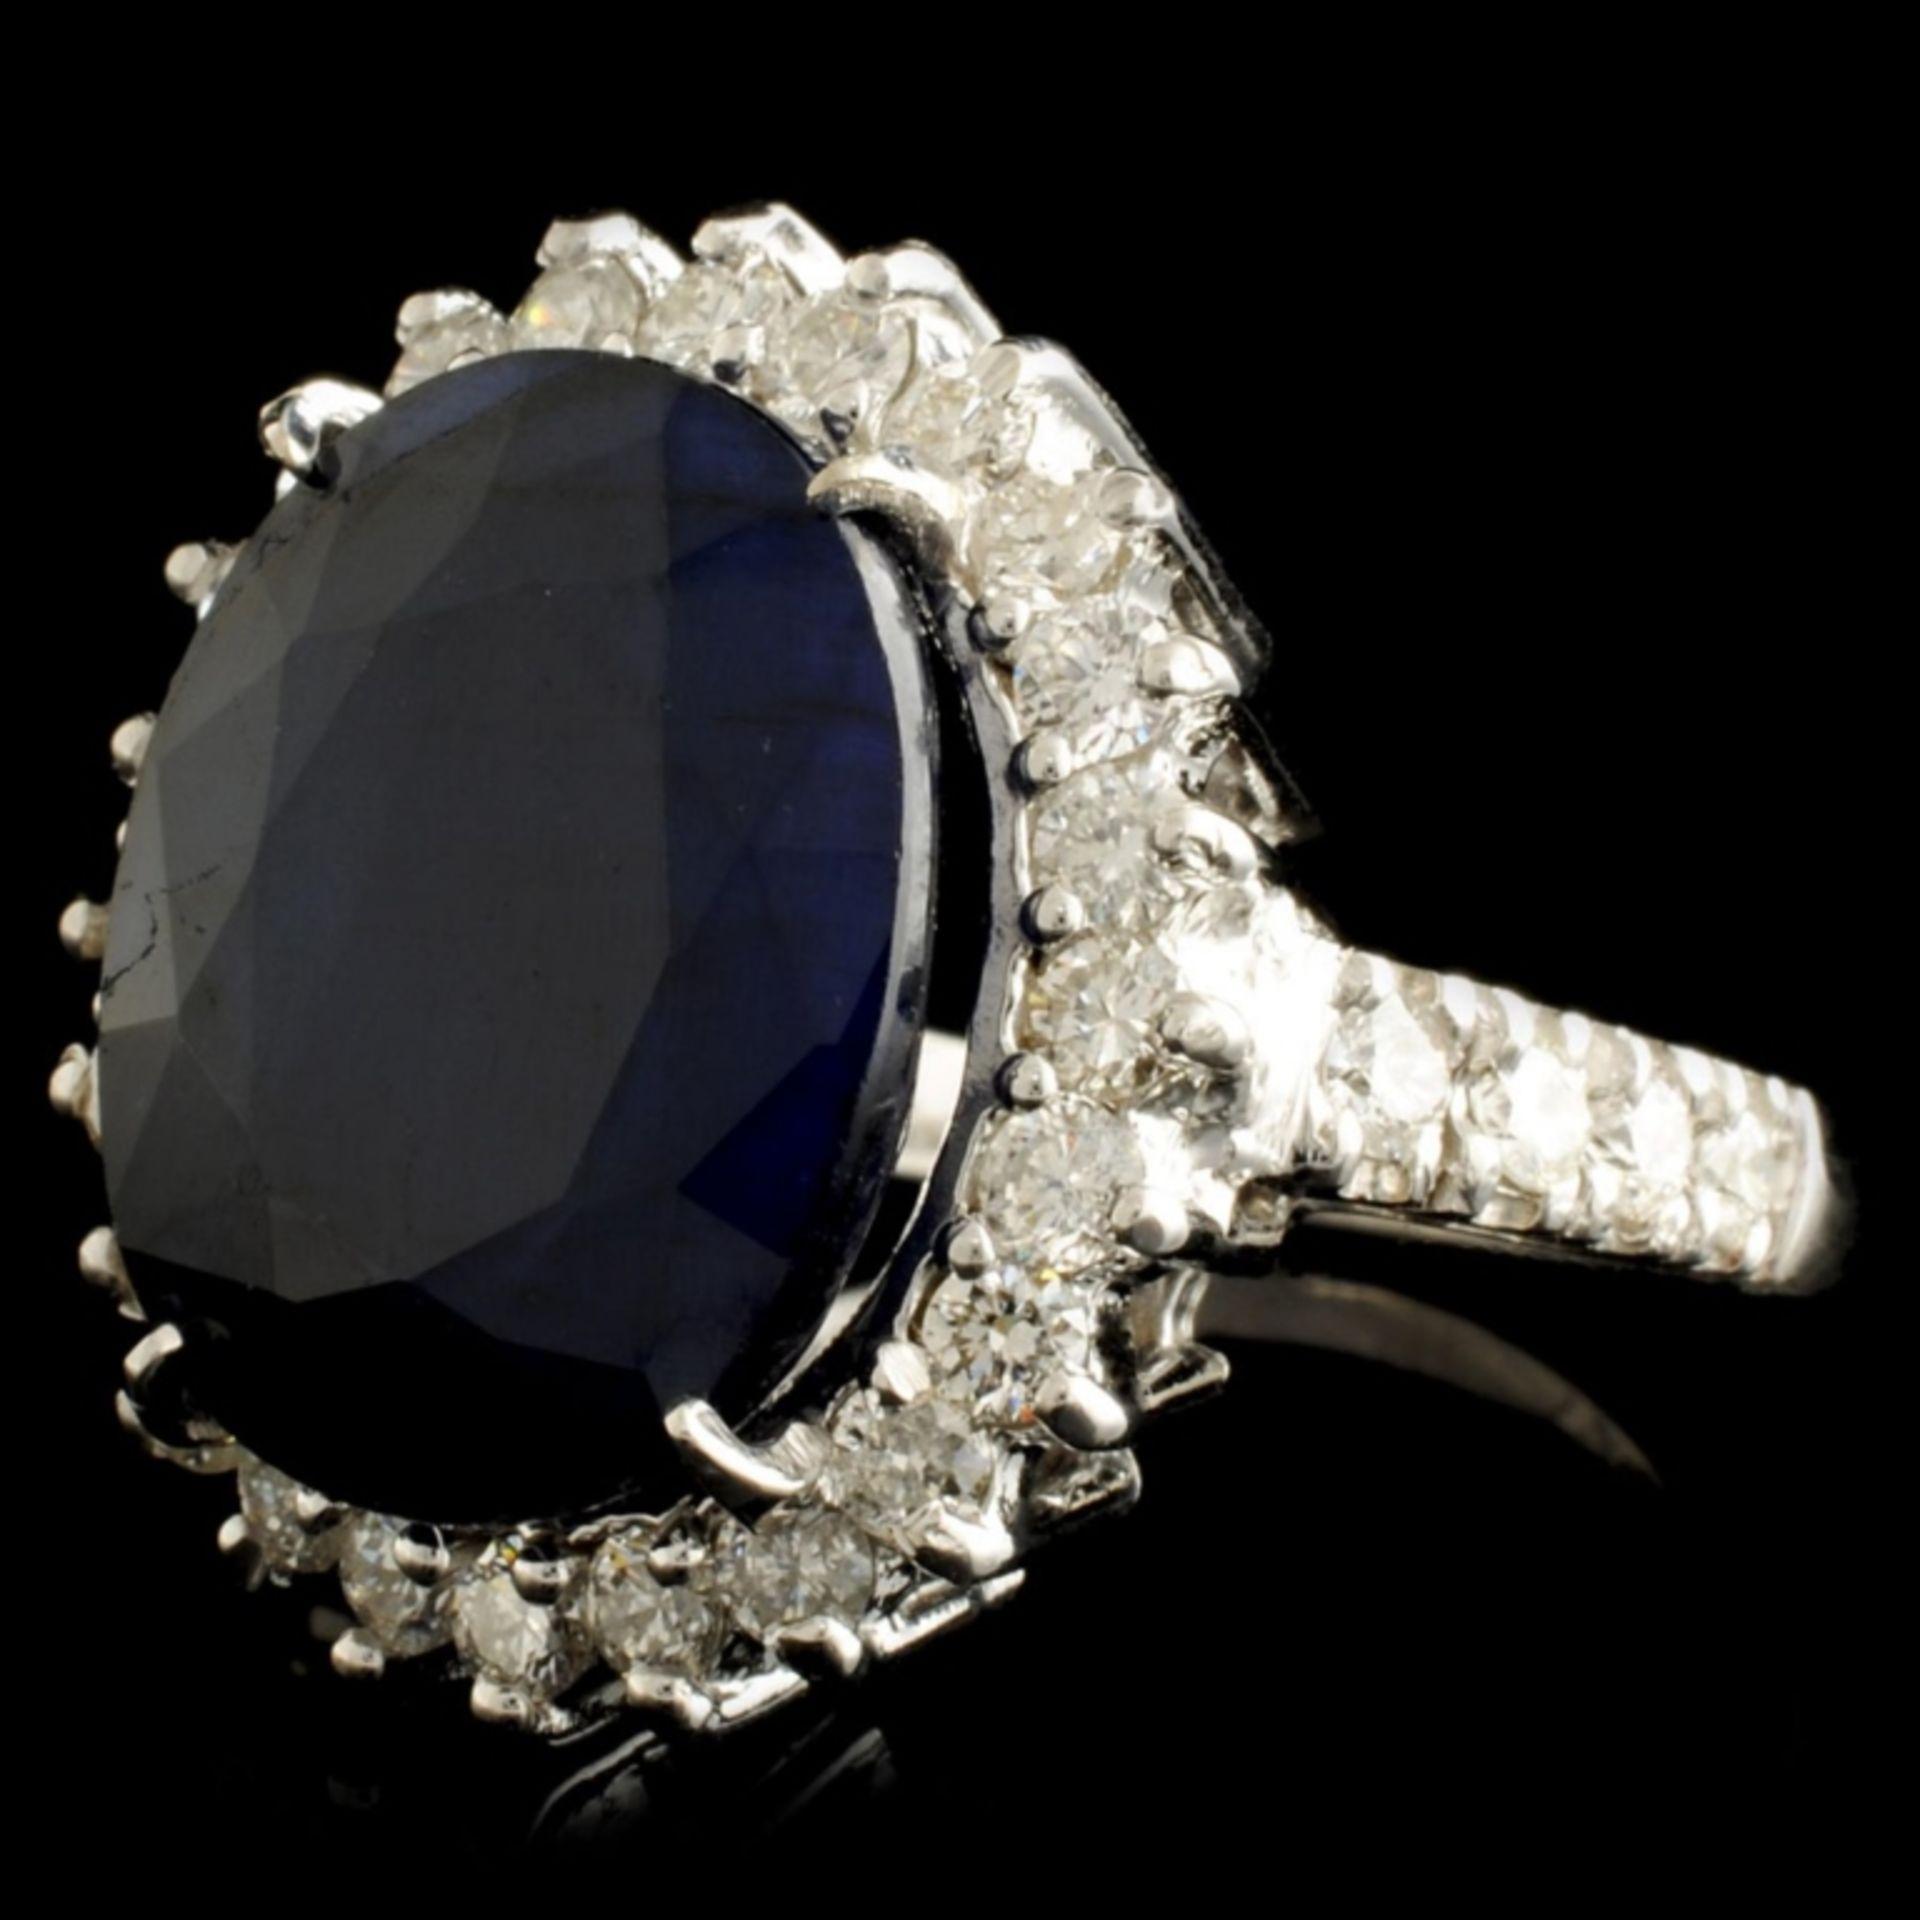 14K Gold 11.90ct Sapphire & 1.24ctw Diamond Ring - Image 2 of 5